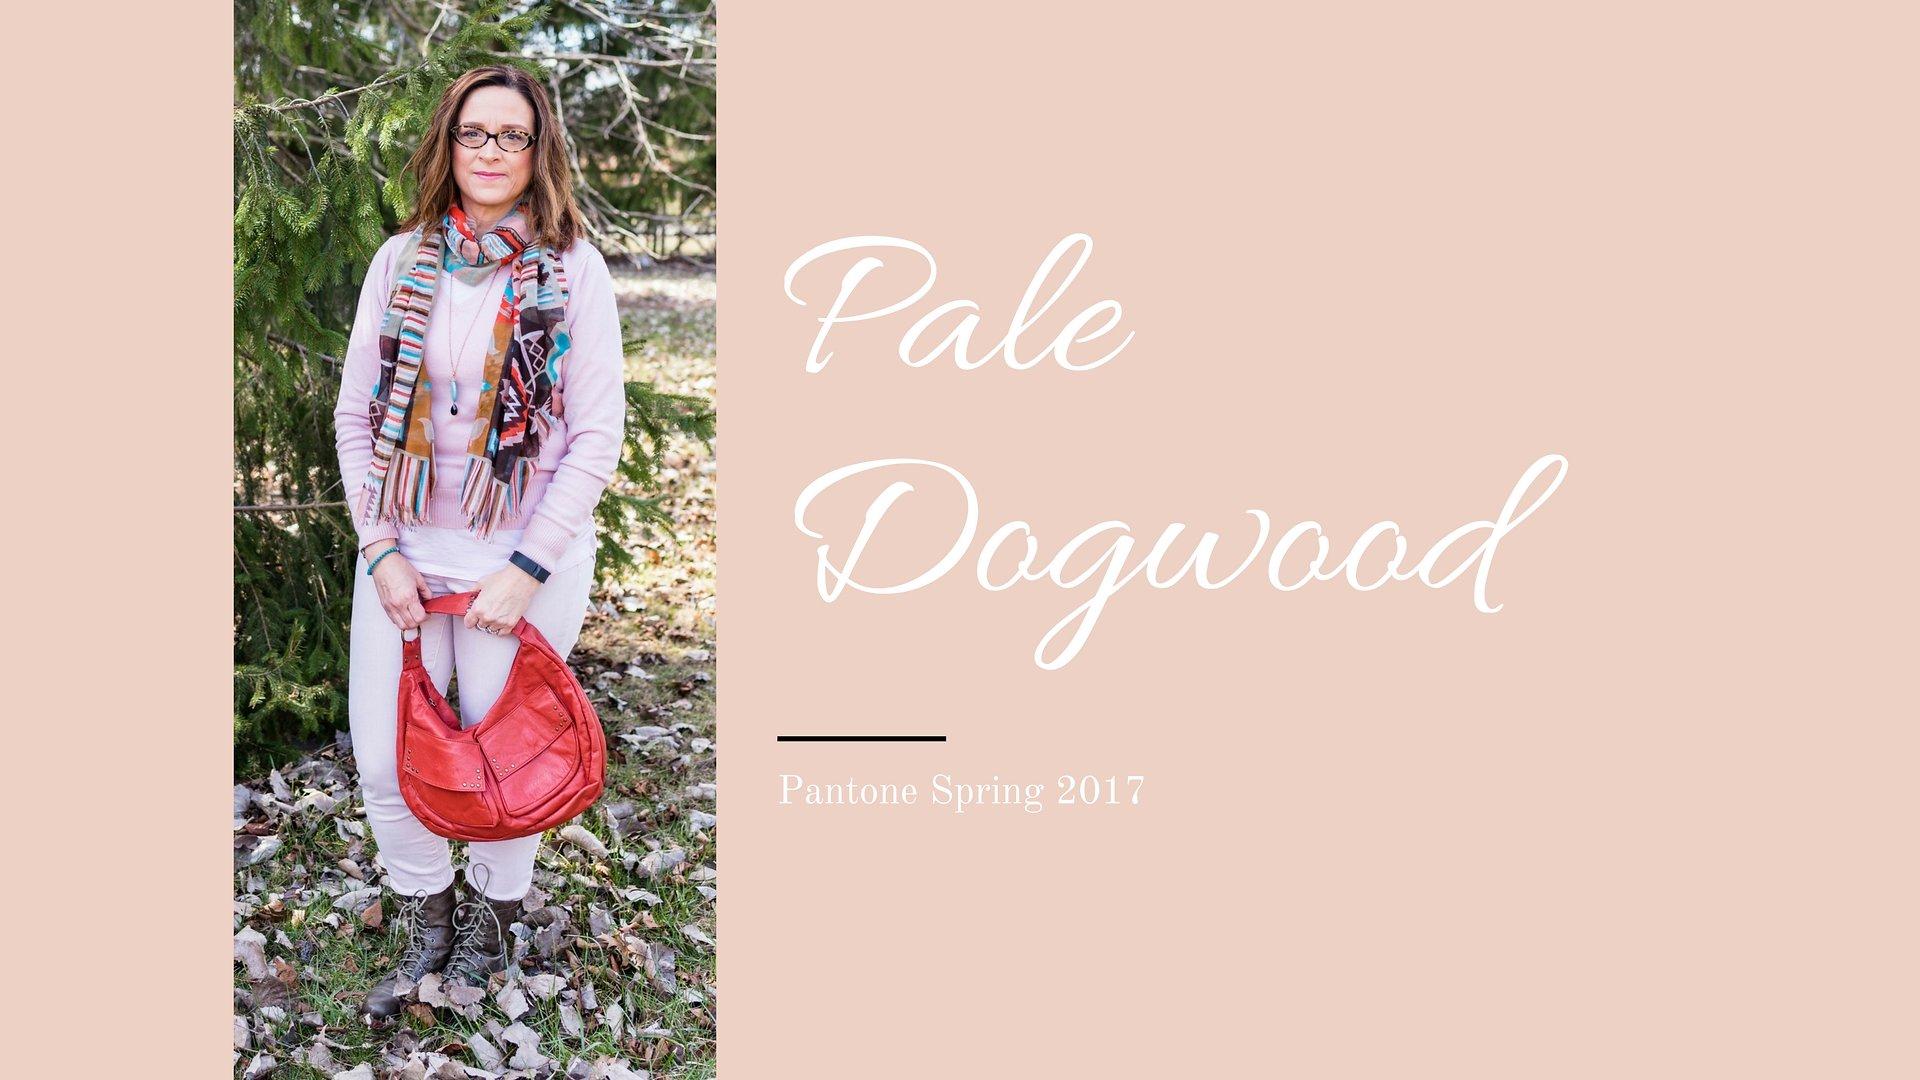 Pantone Spring 2017 - Pale Dogwood